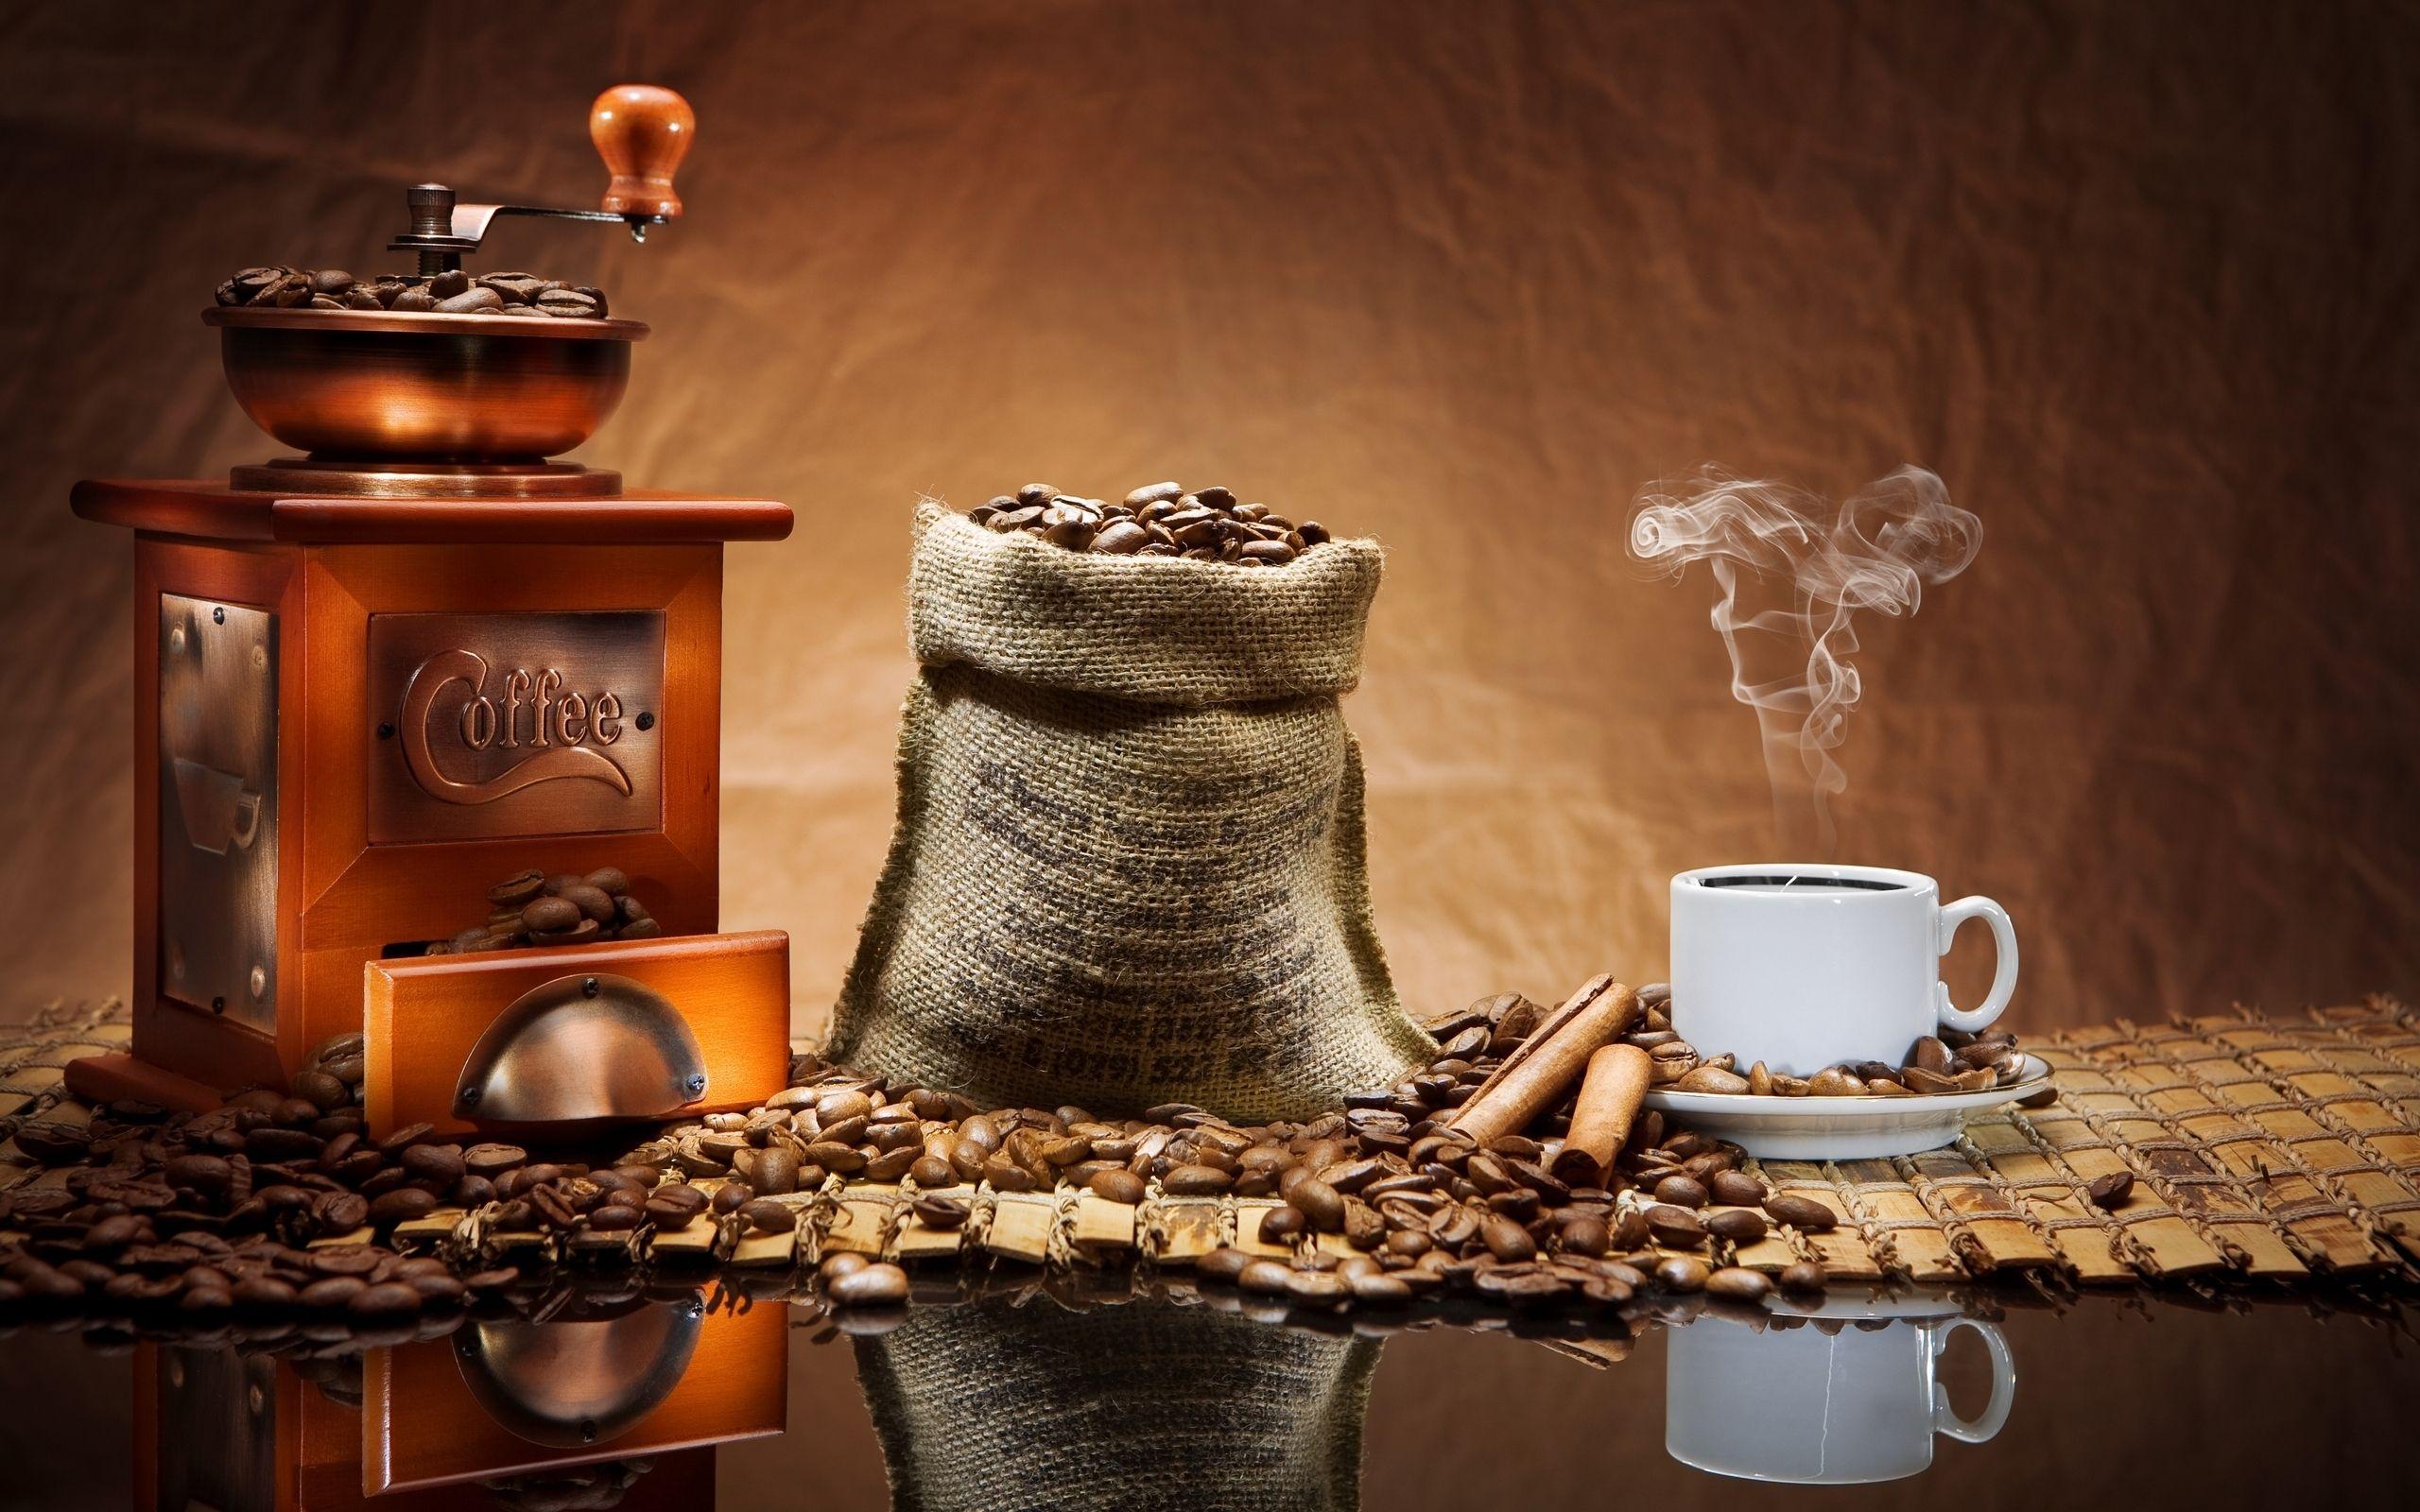 Coffee 2 Coffee Wallpaper Coffee Accessories Coffee Roasting Hd wallpaper coffee grinder coffee beans